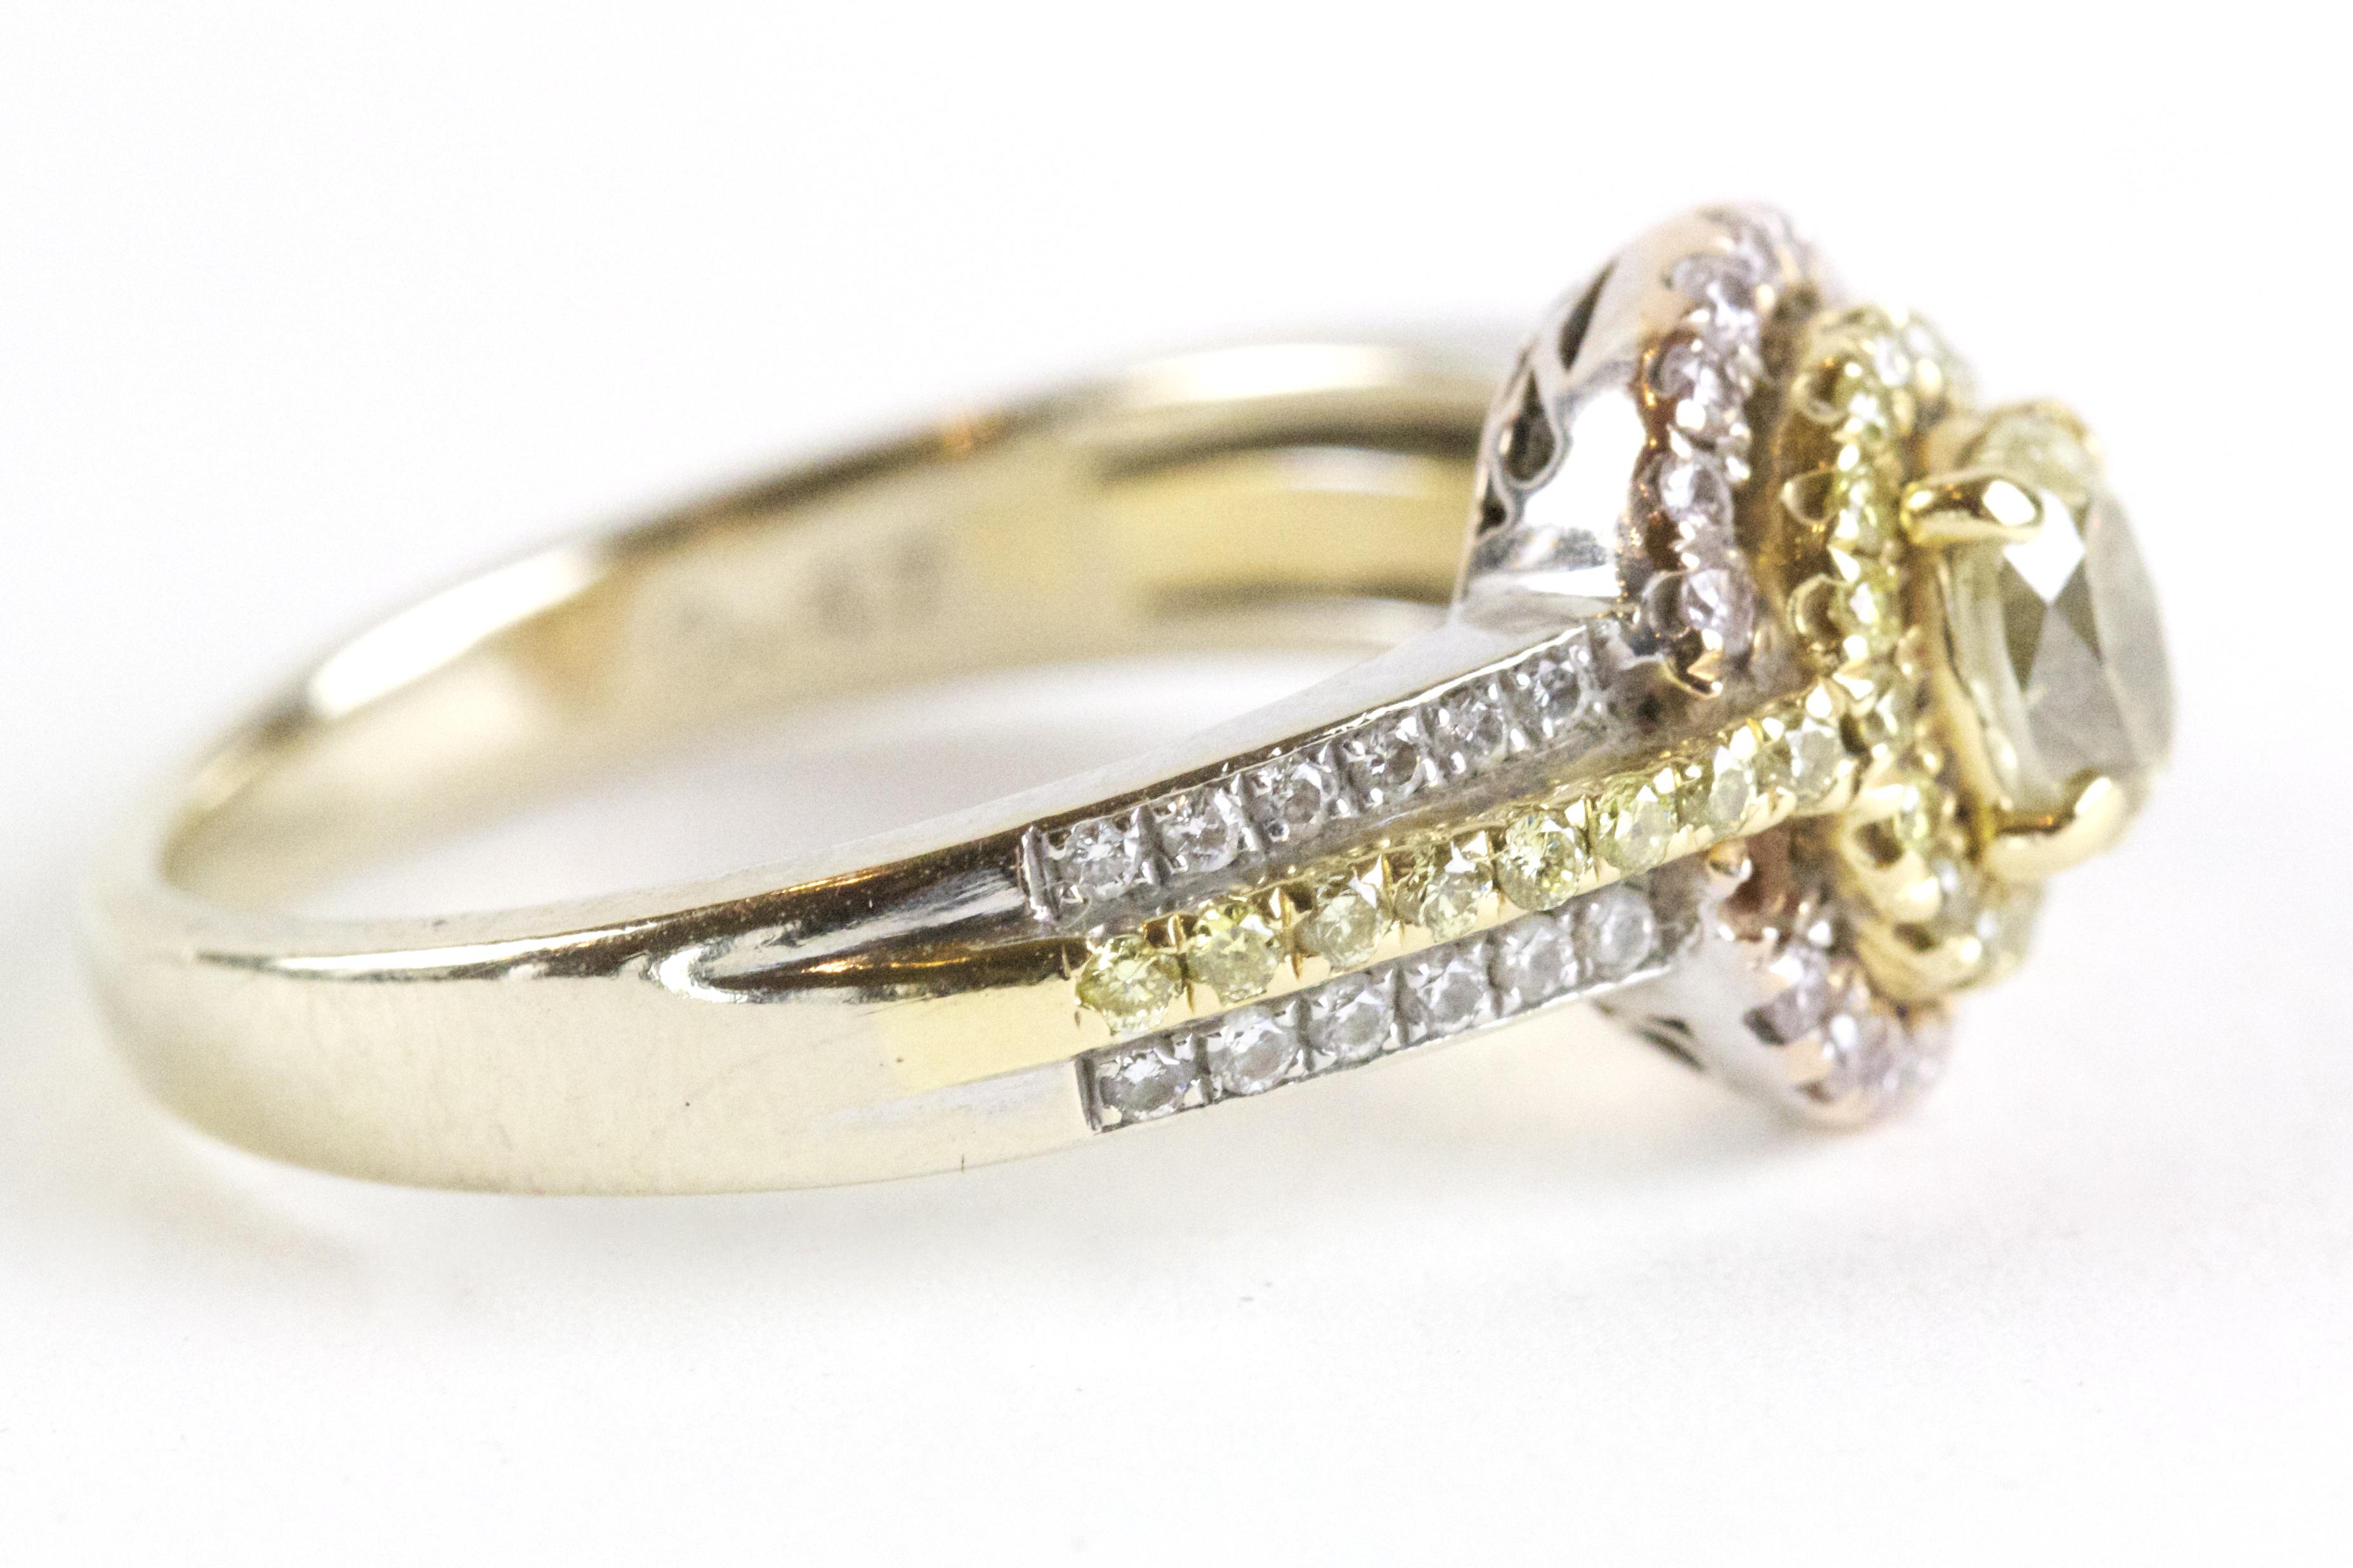 Gold and Diamonds Ring. Jewelry Repair